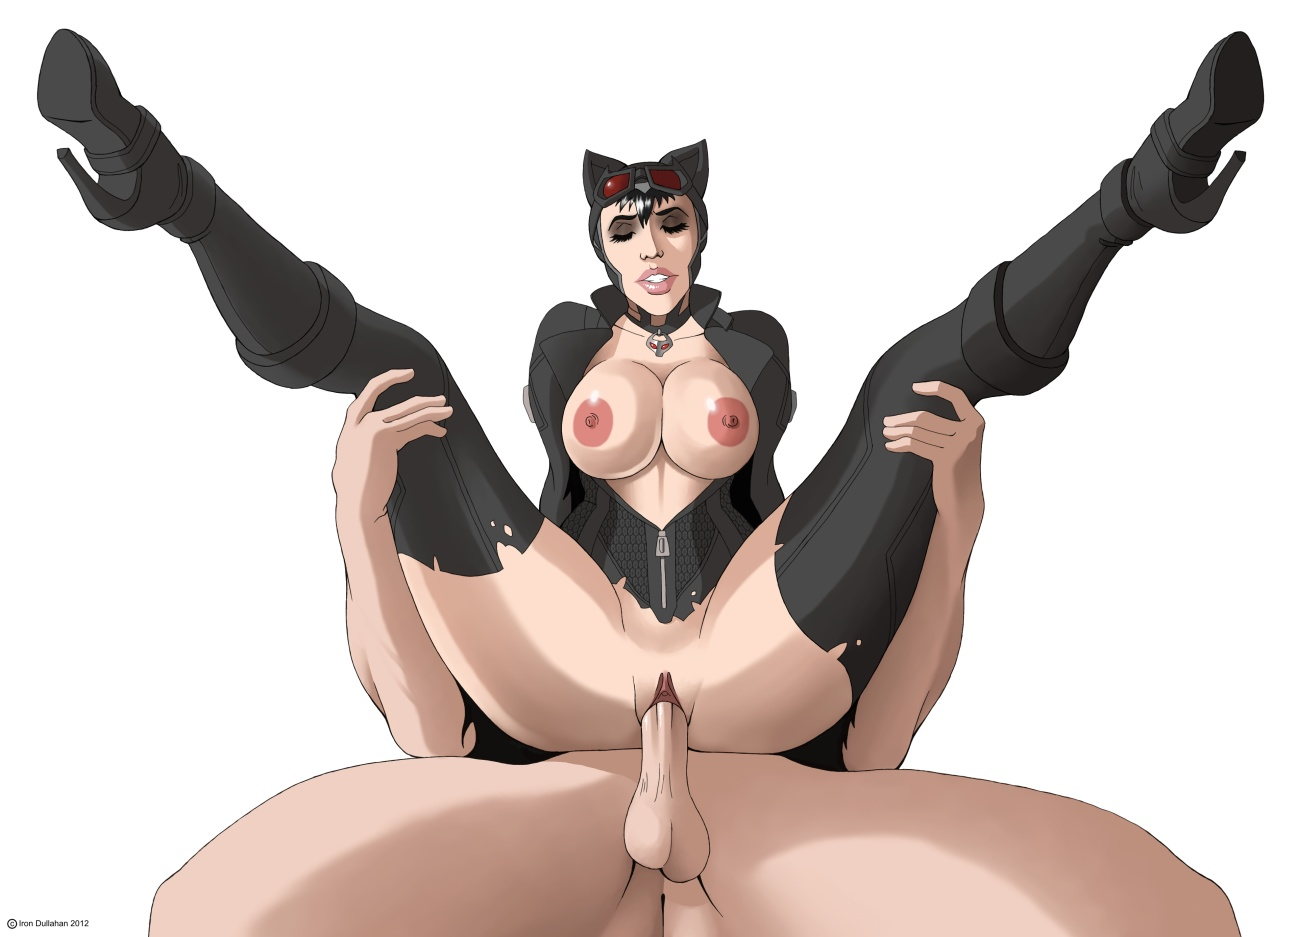 Catwoman sex prono pic fucks pic